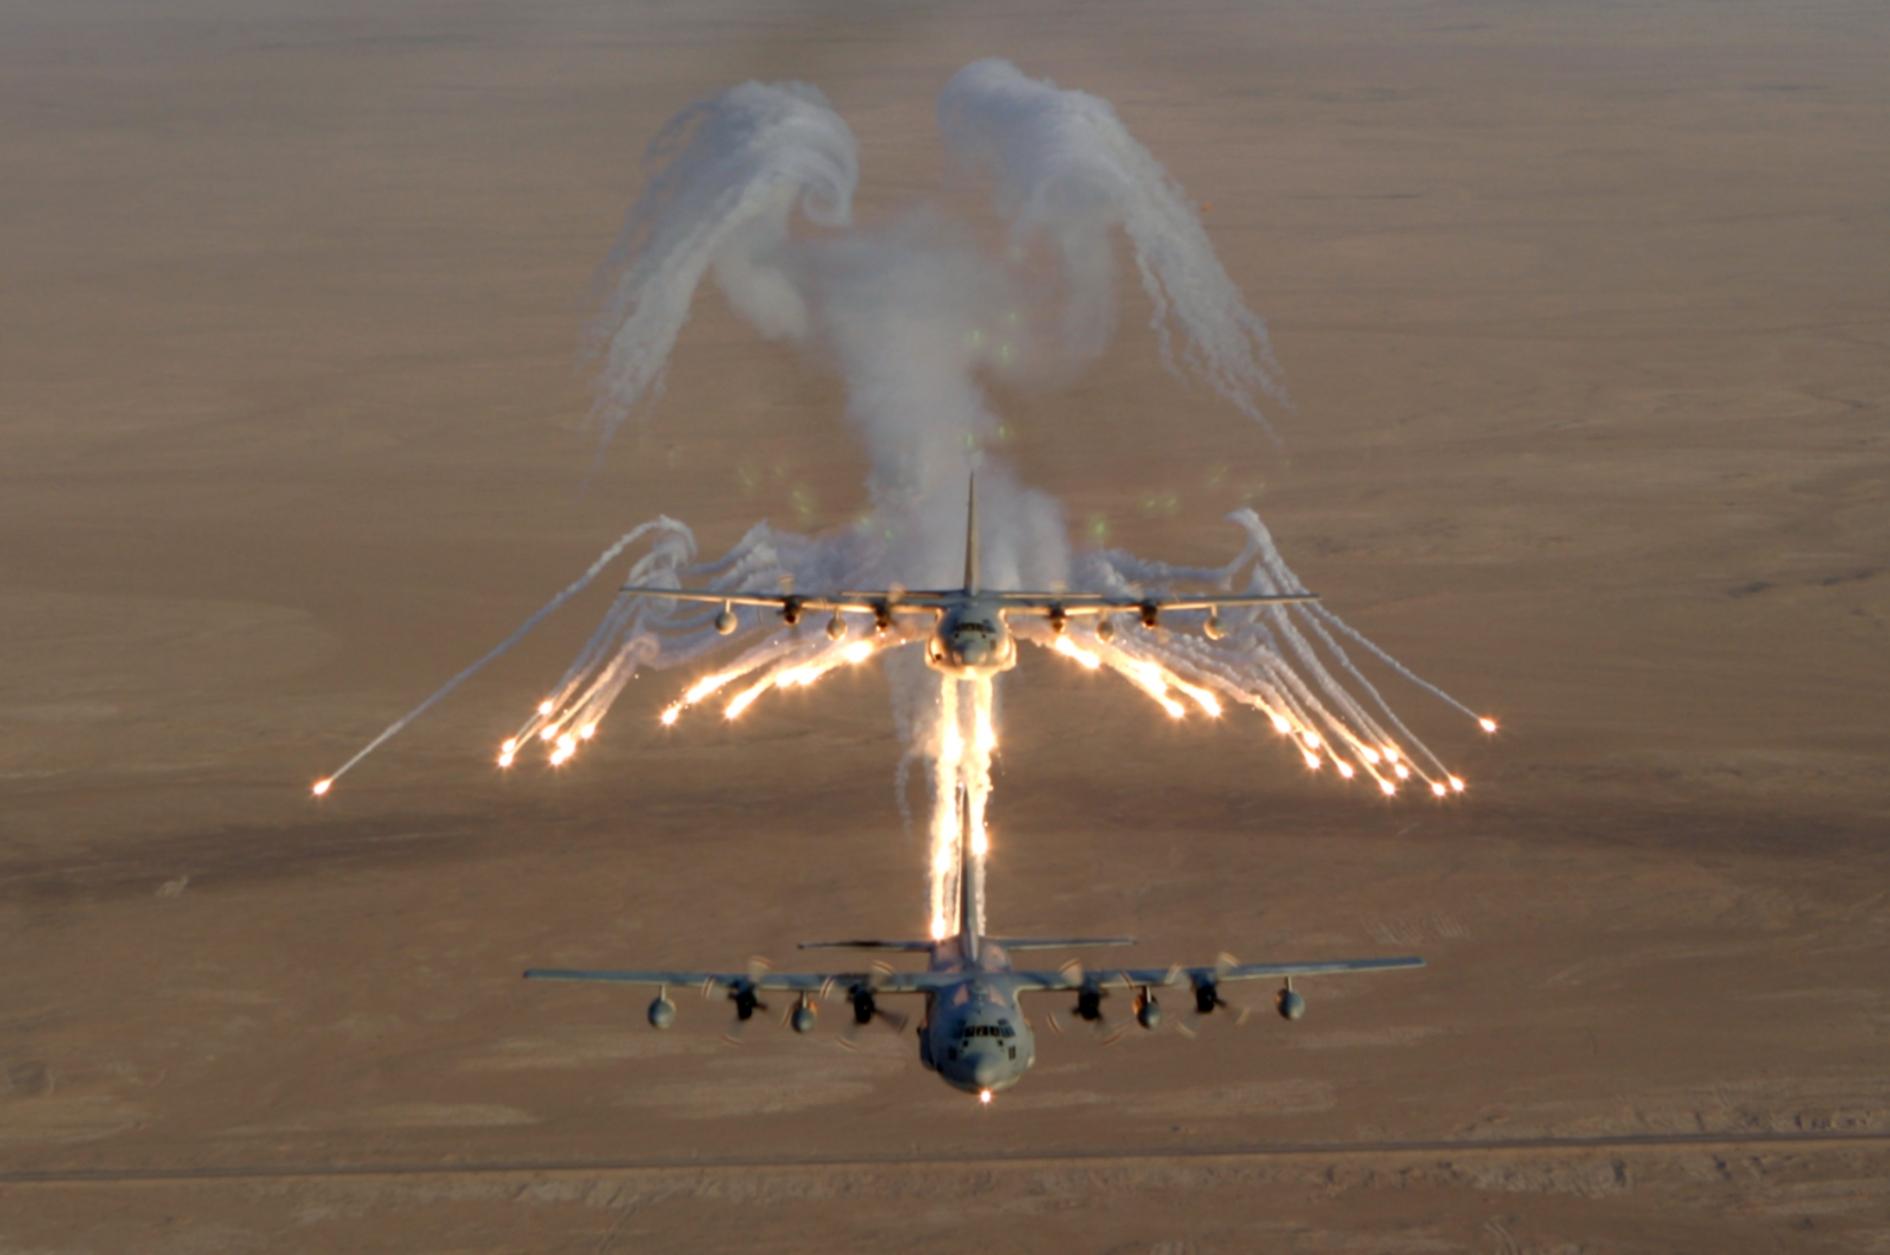 US-Marine-Corps-KC-130-Hercules